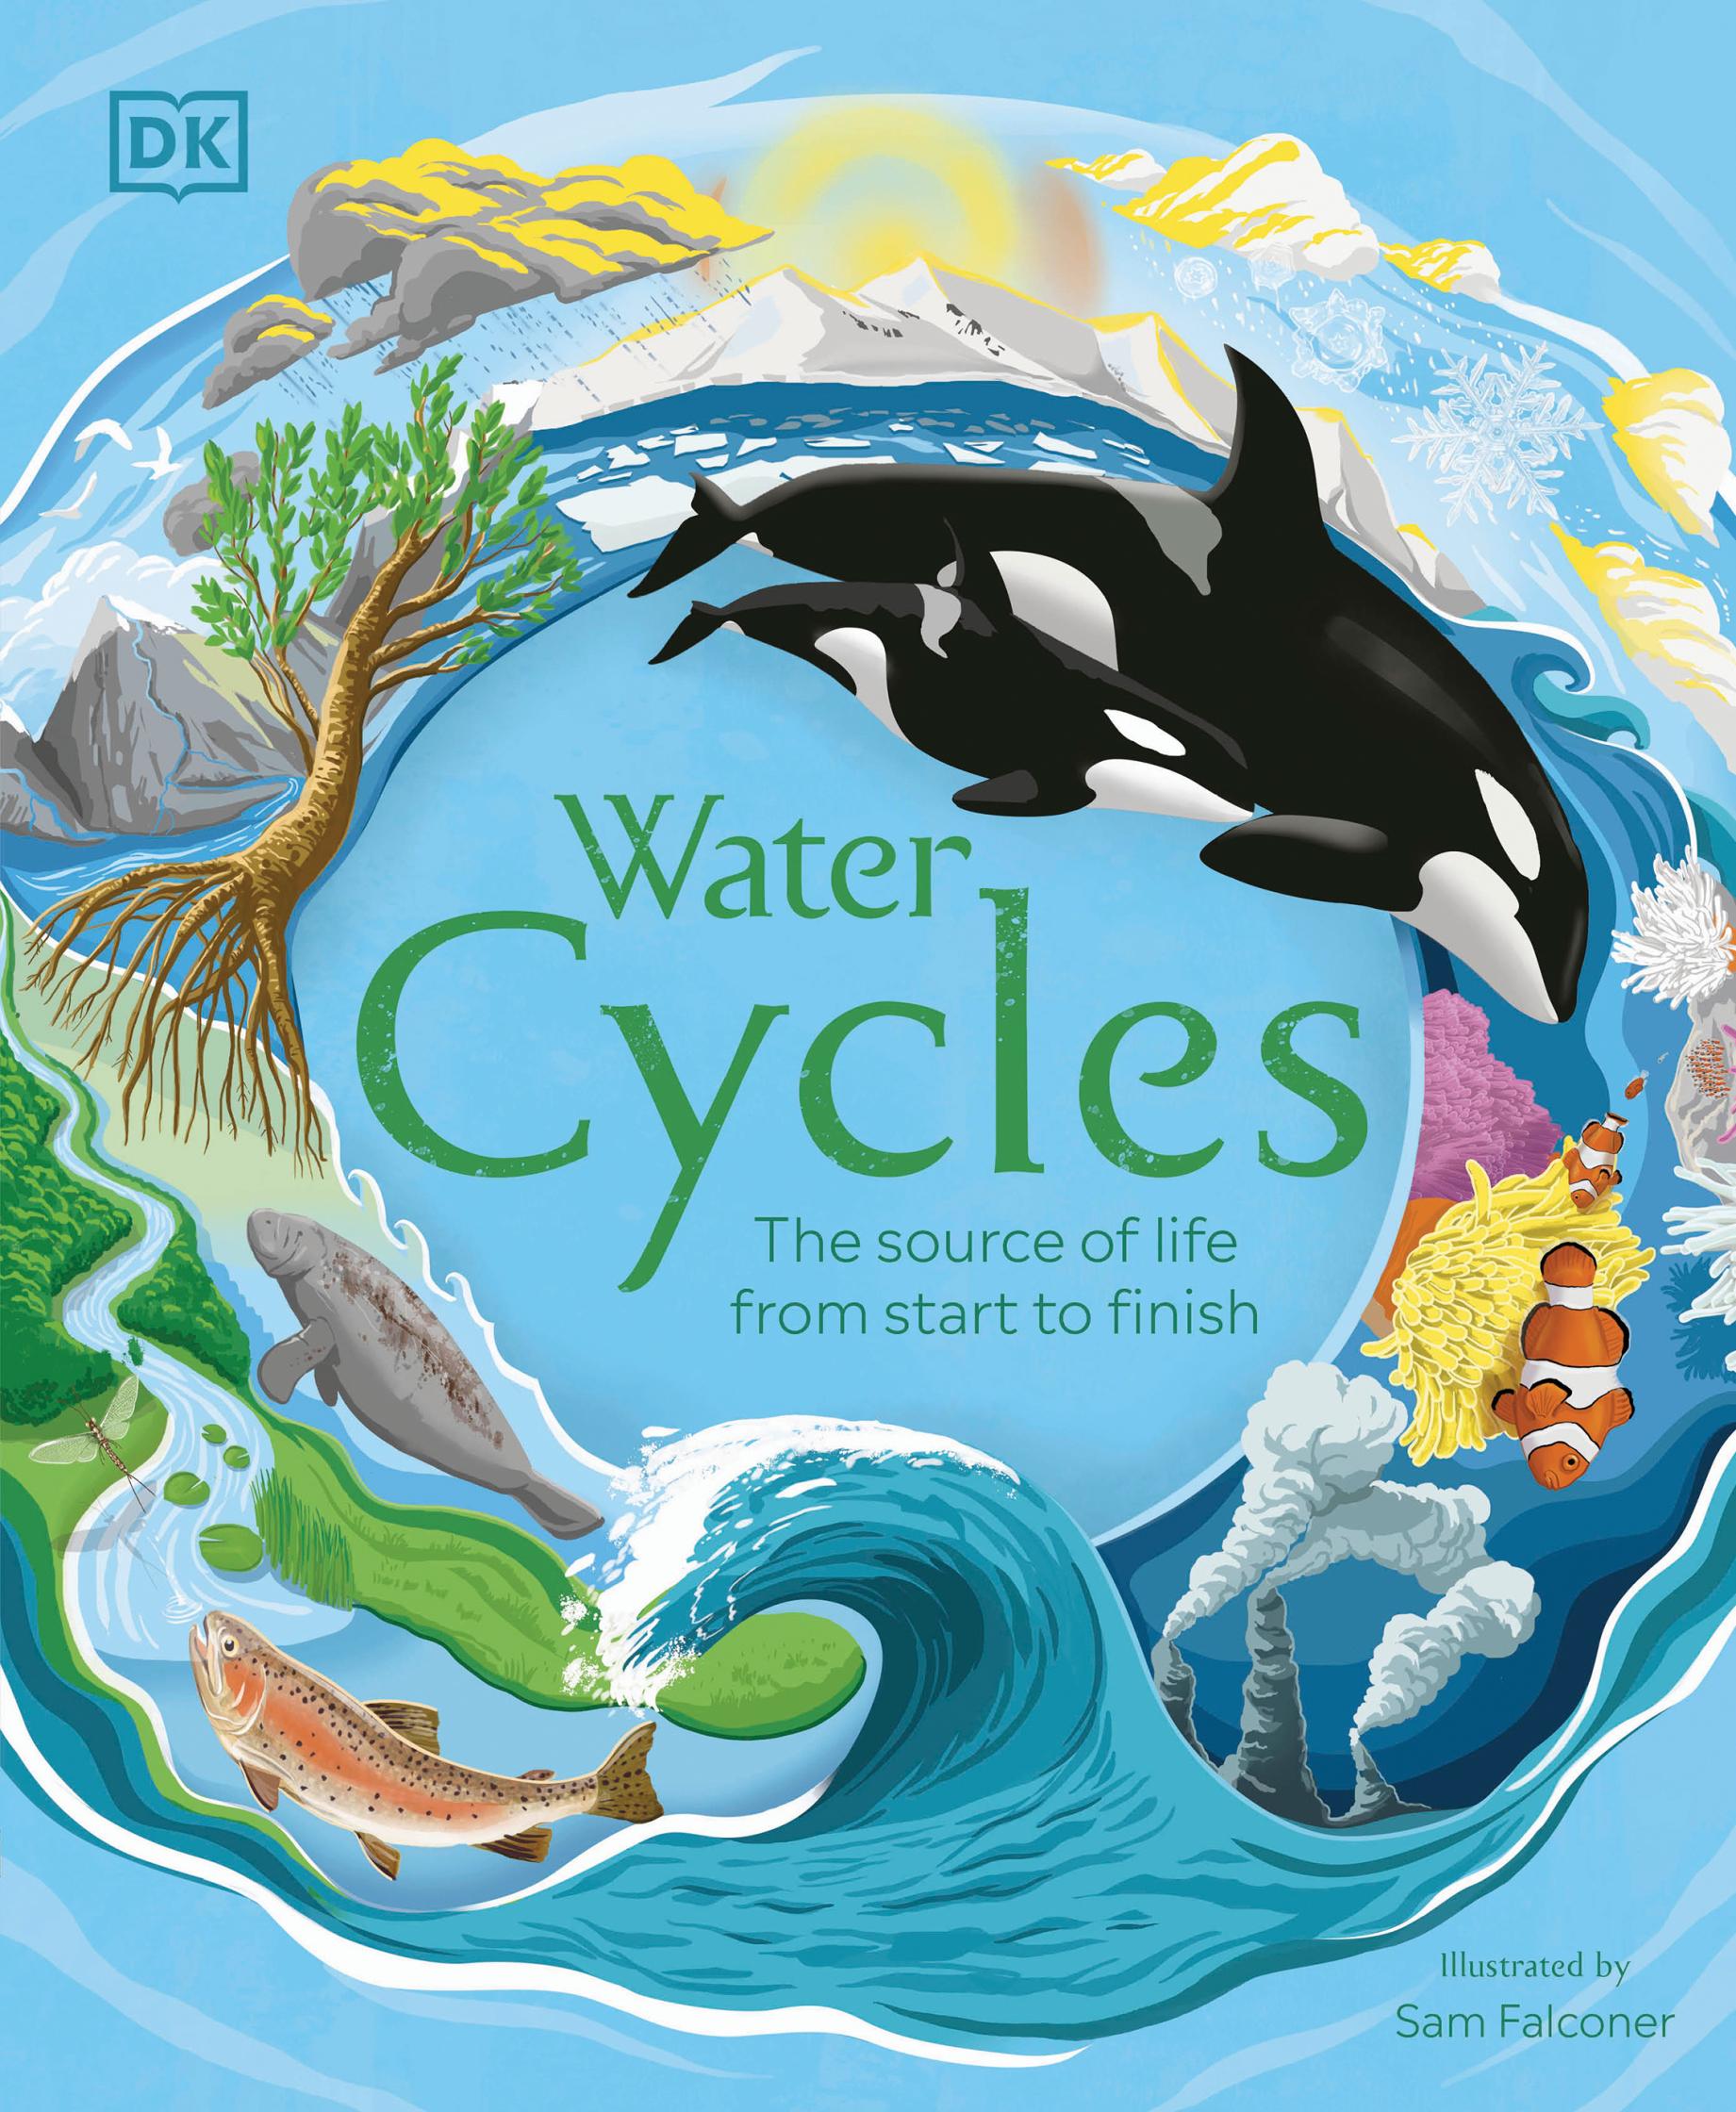 Water Cycles for DK.jpg